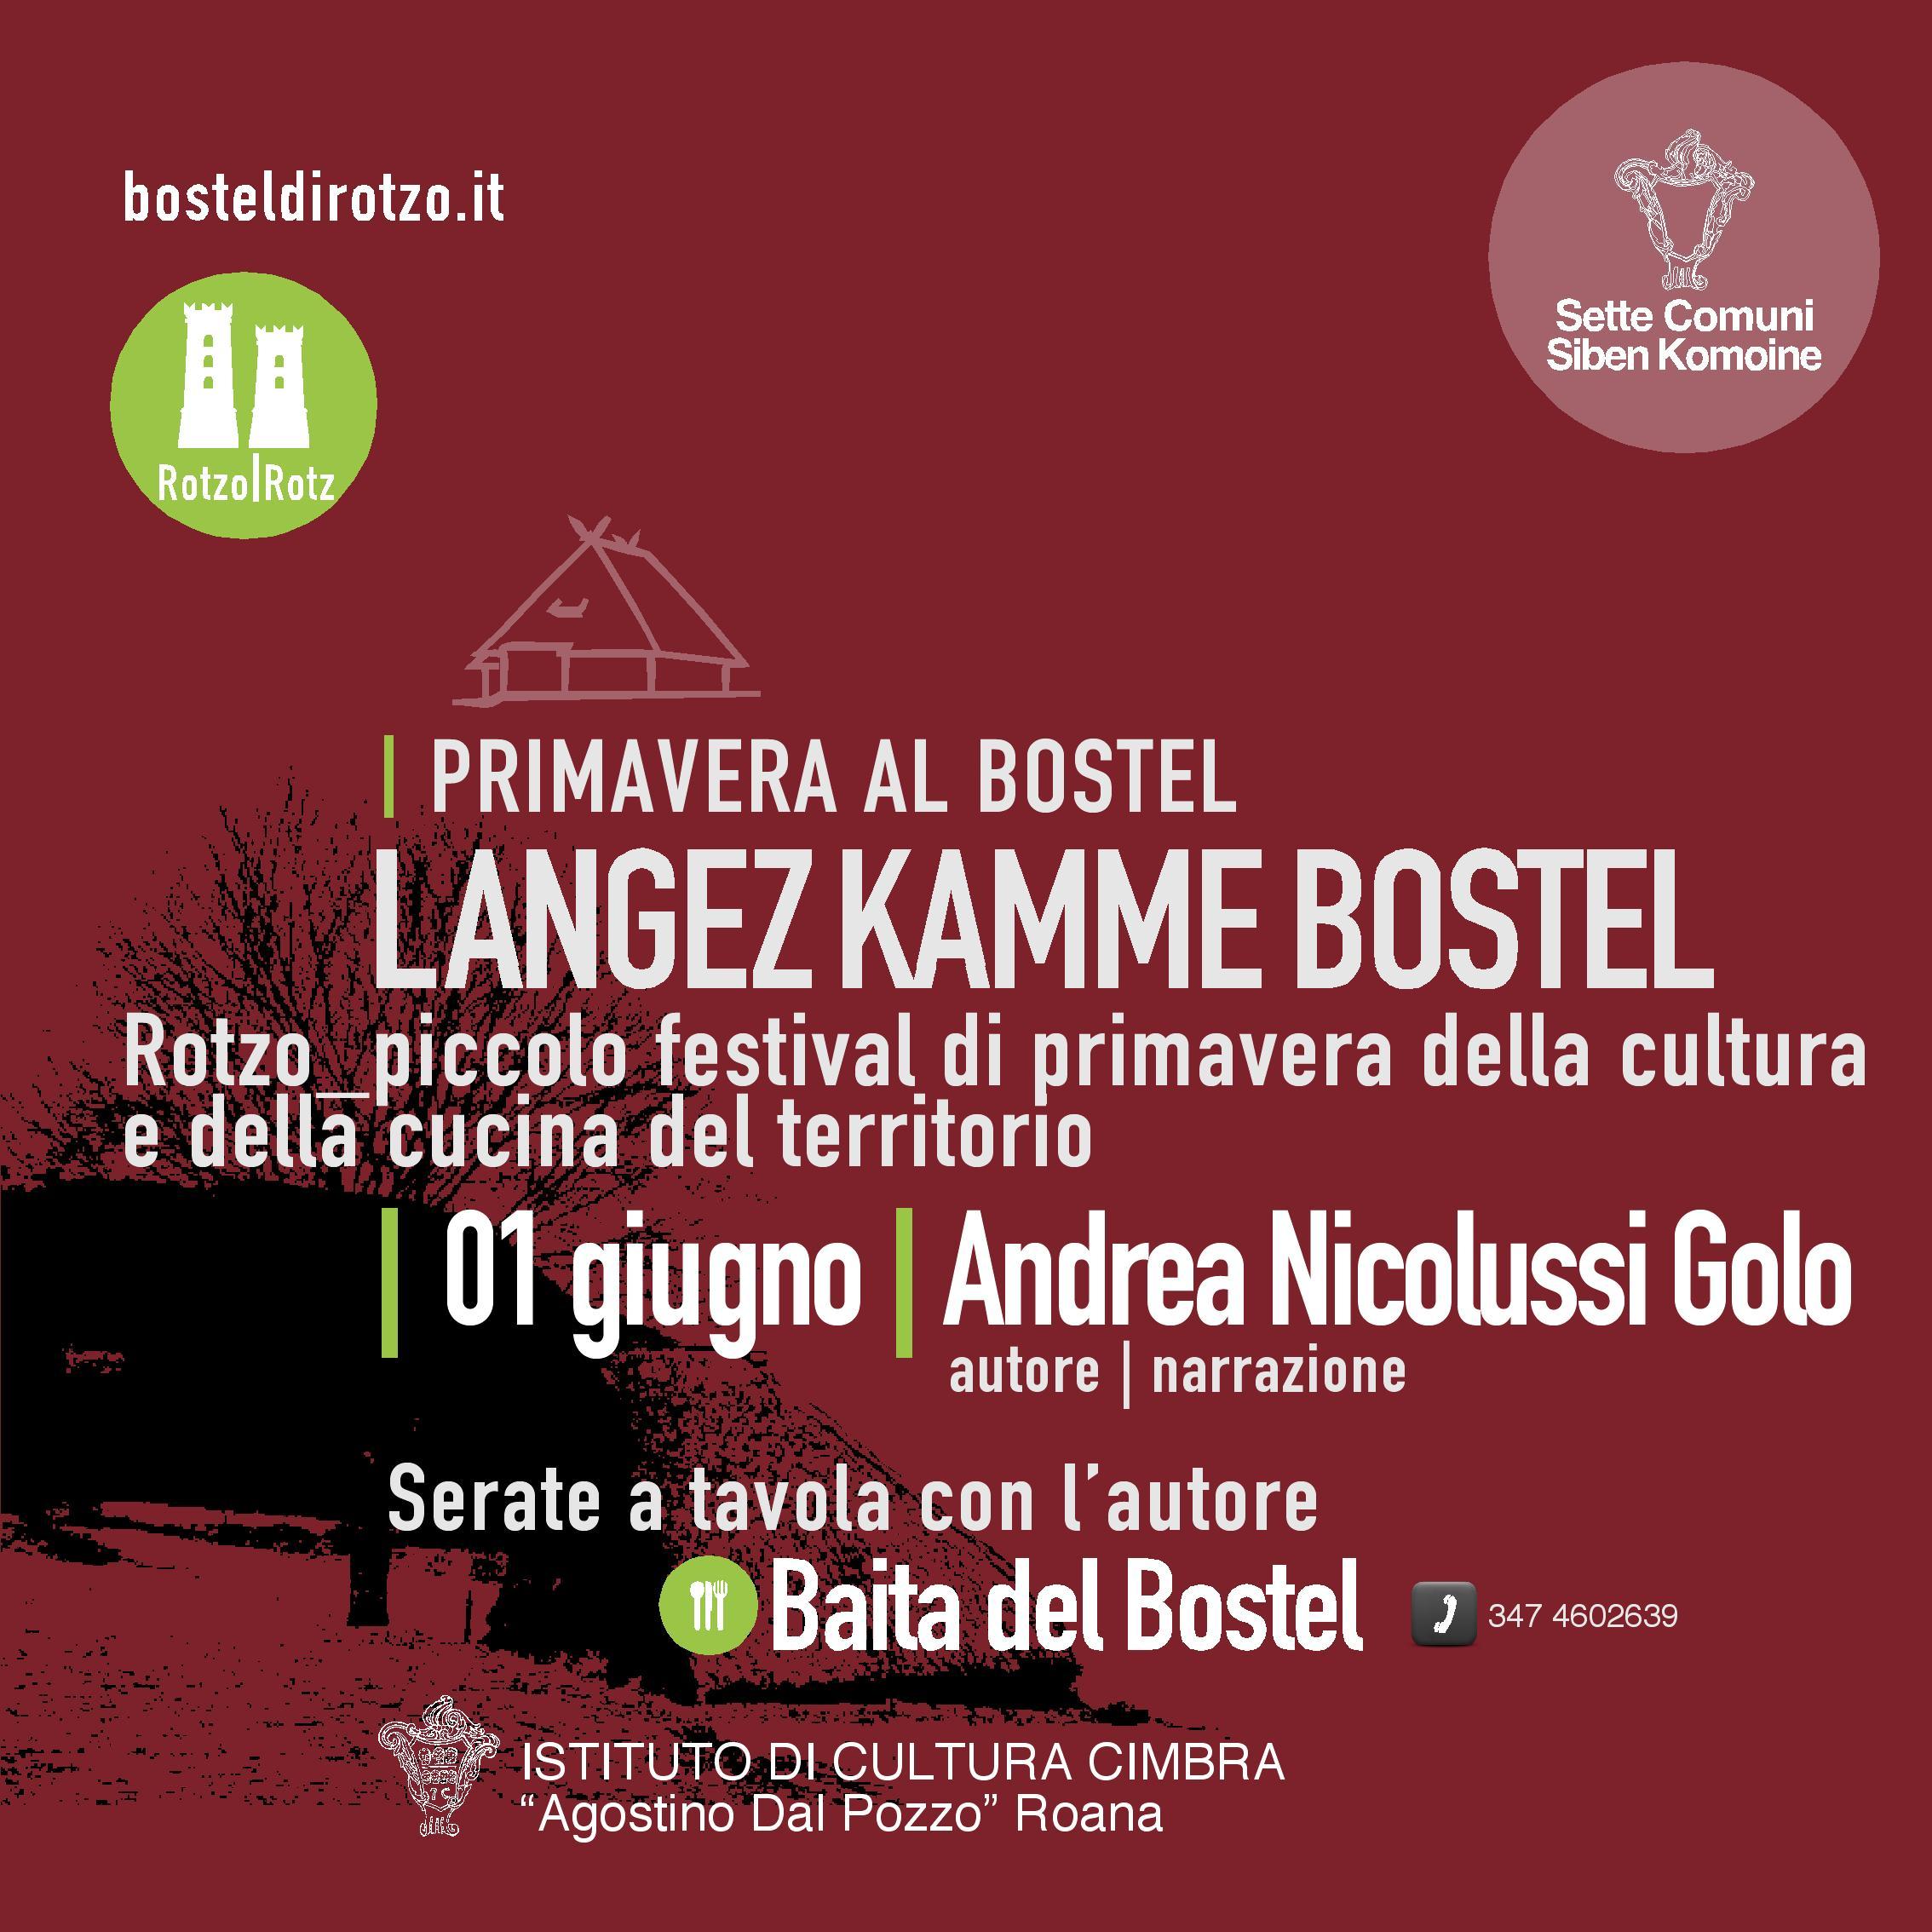 Langez Kamme Bostel – 01.06.2019 – Andrea Nicolussi Golo